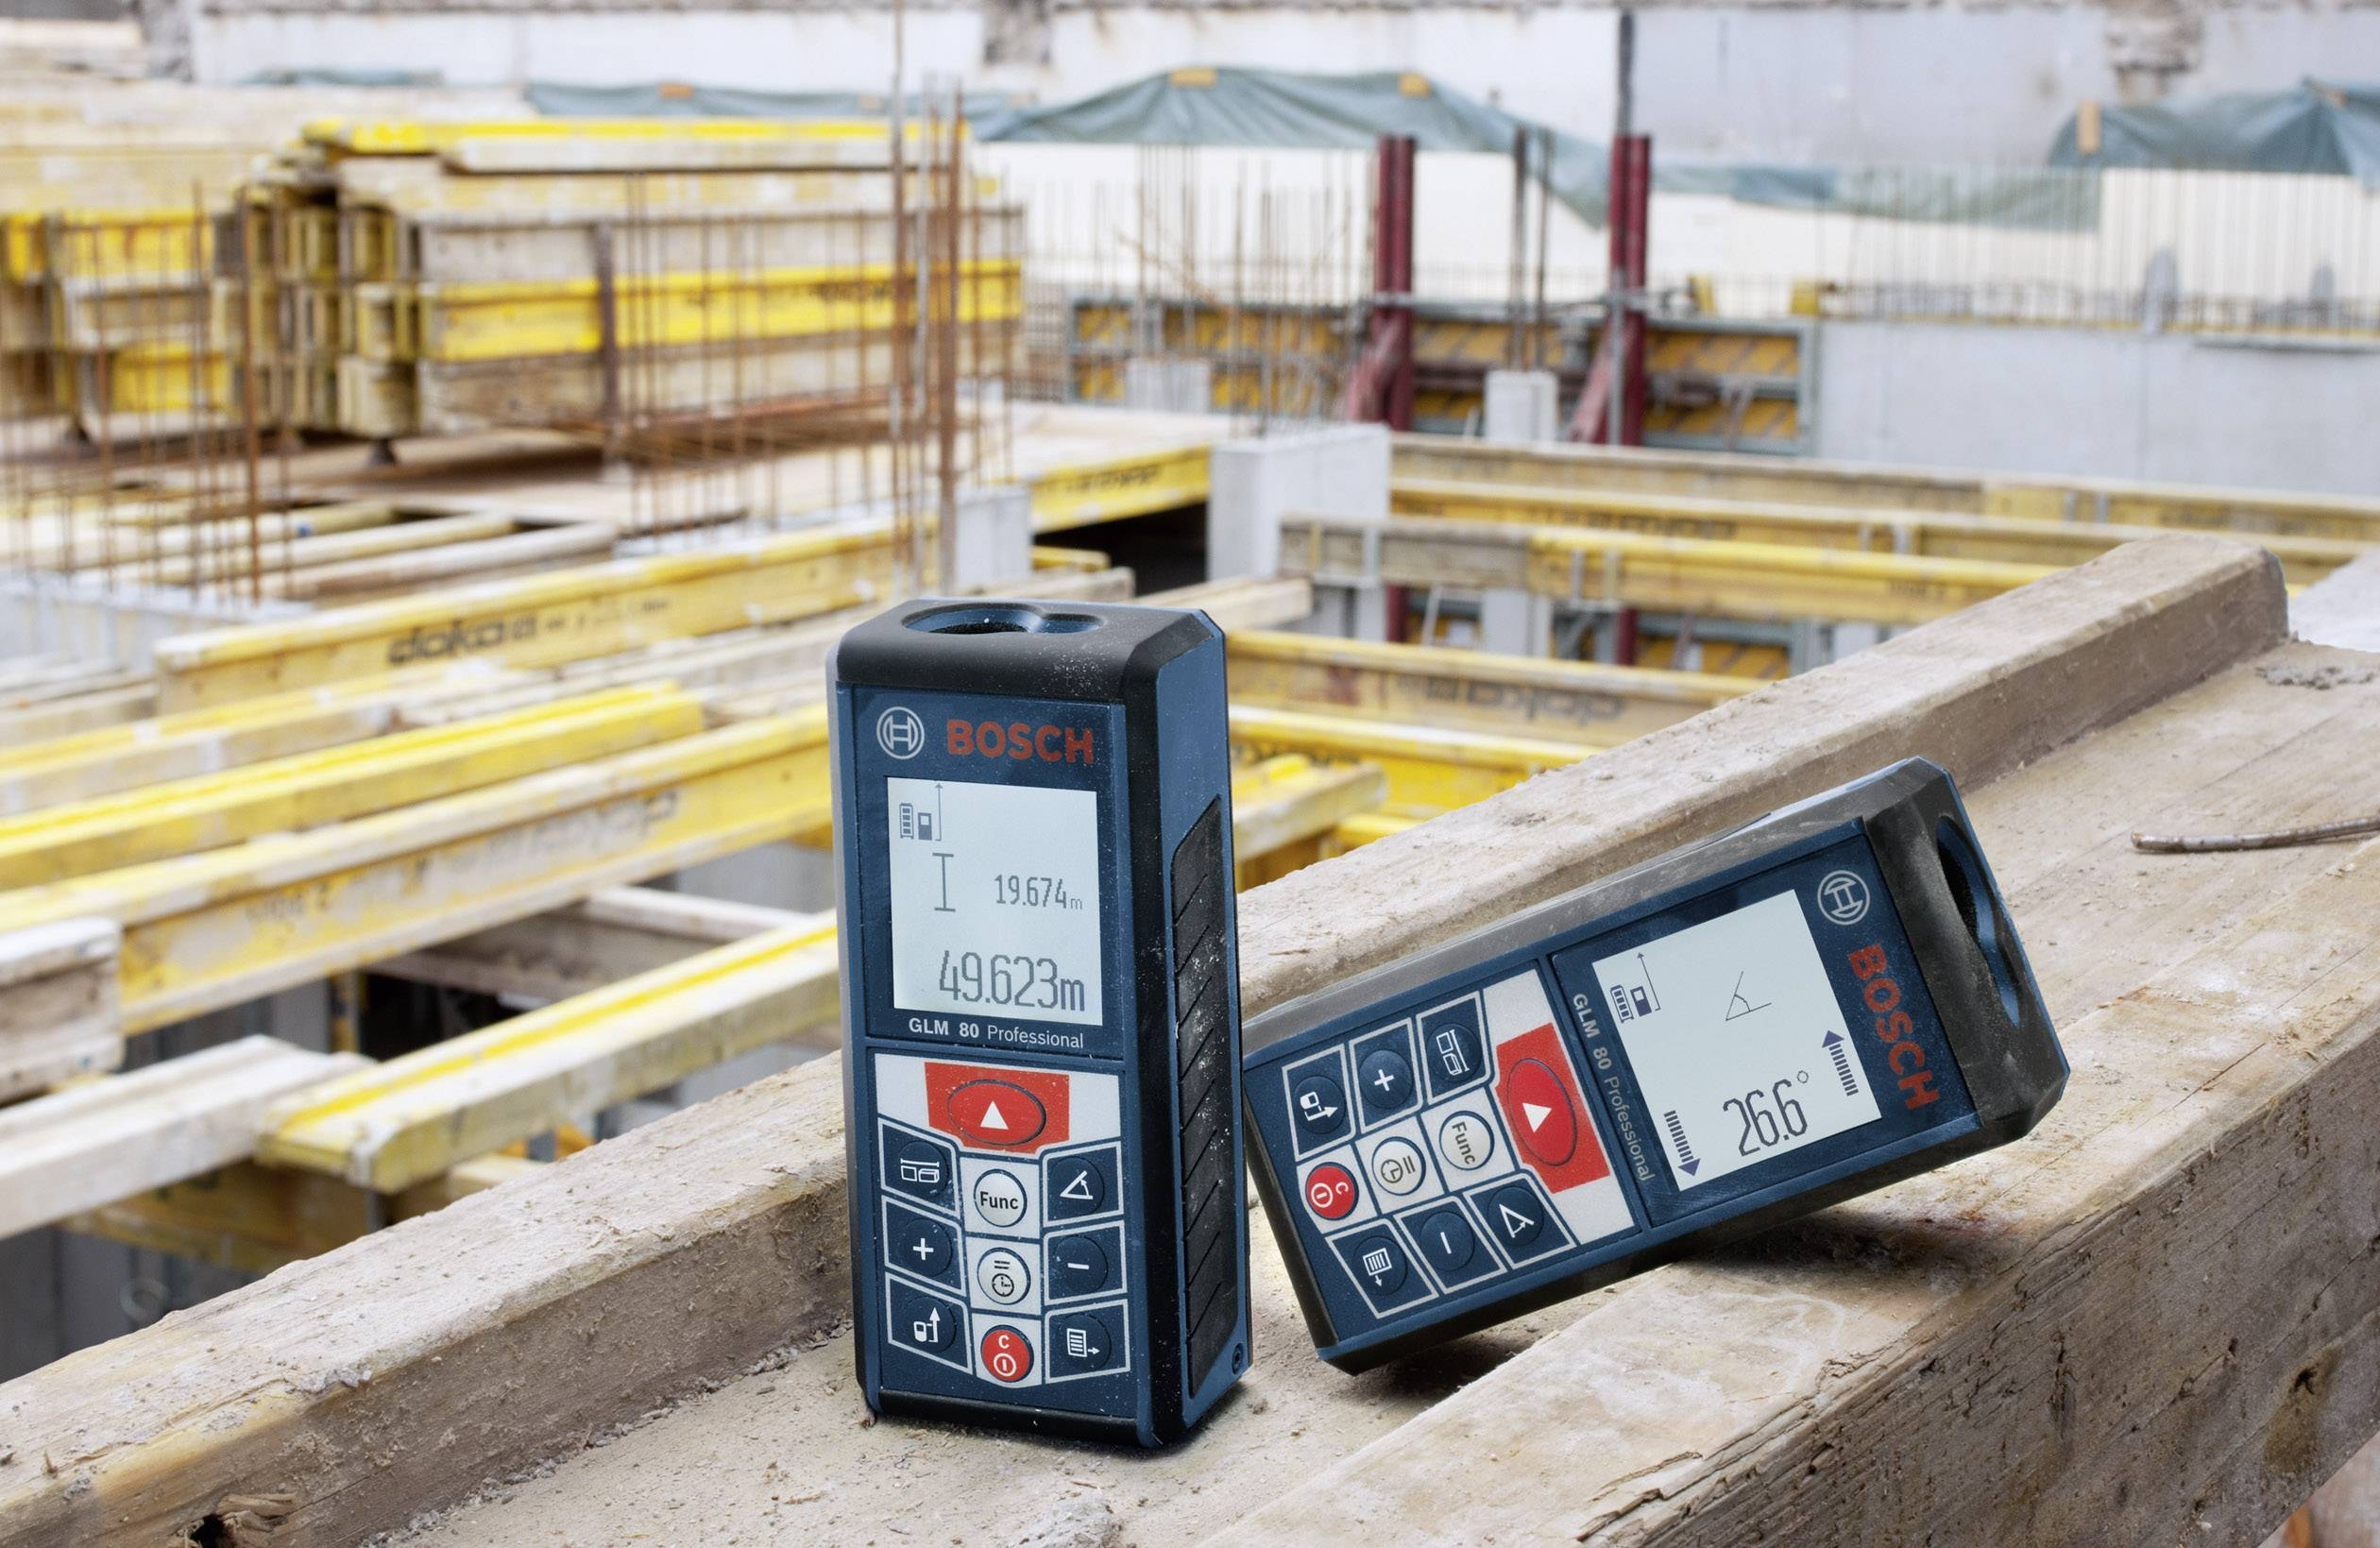 Bosch Entfernungsmesser Blau : Bosch professional glm laser entfernungsmesser li ionen akku